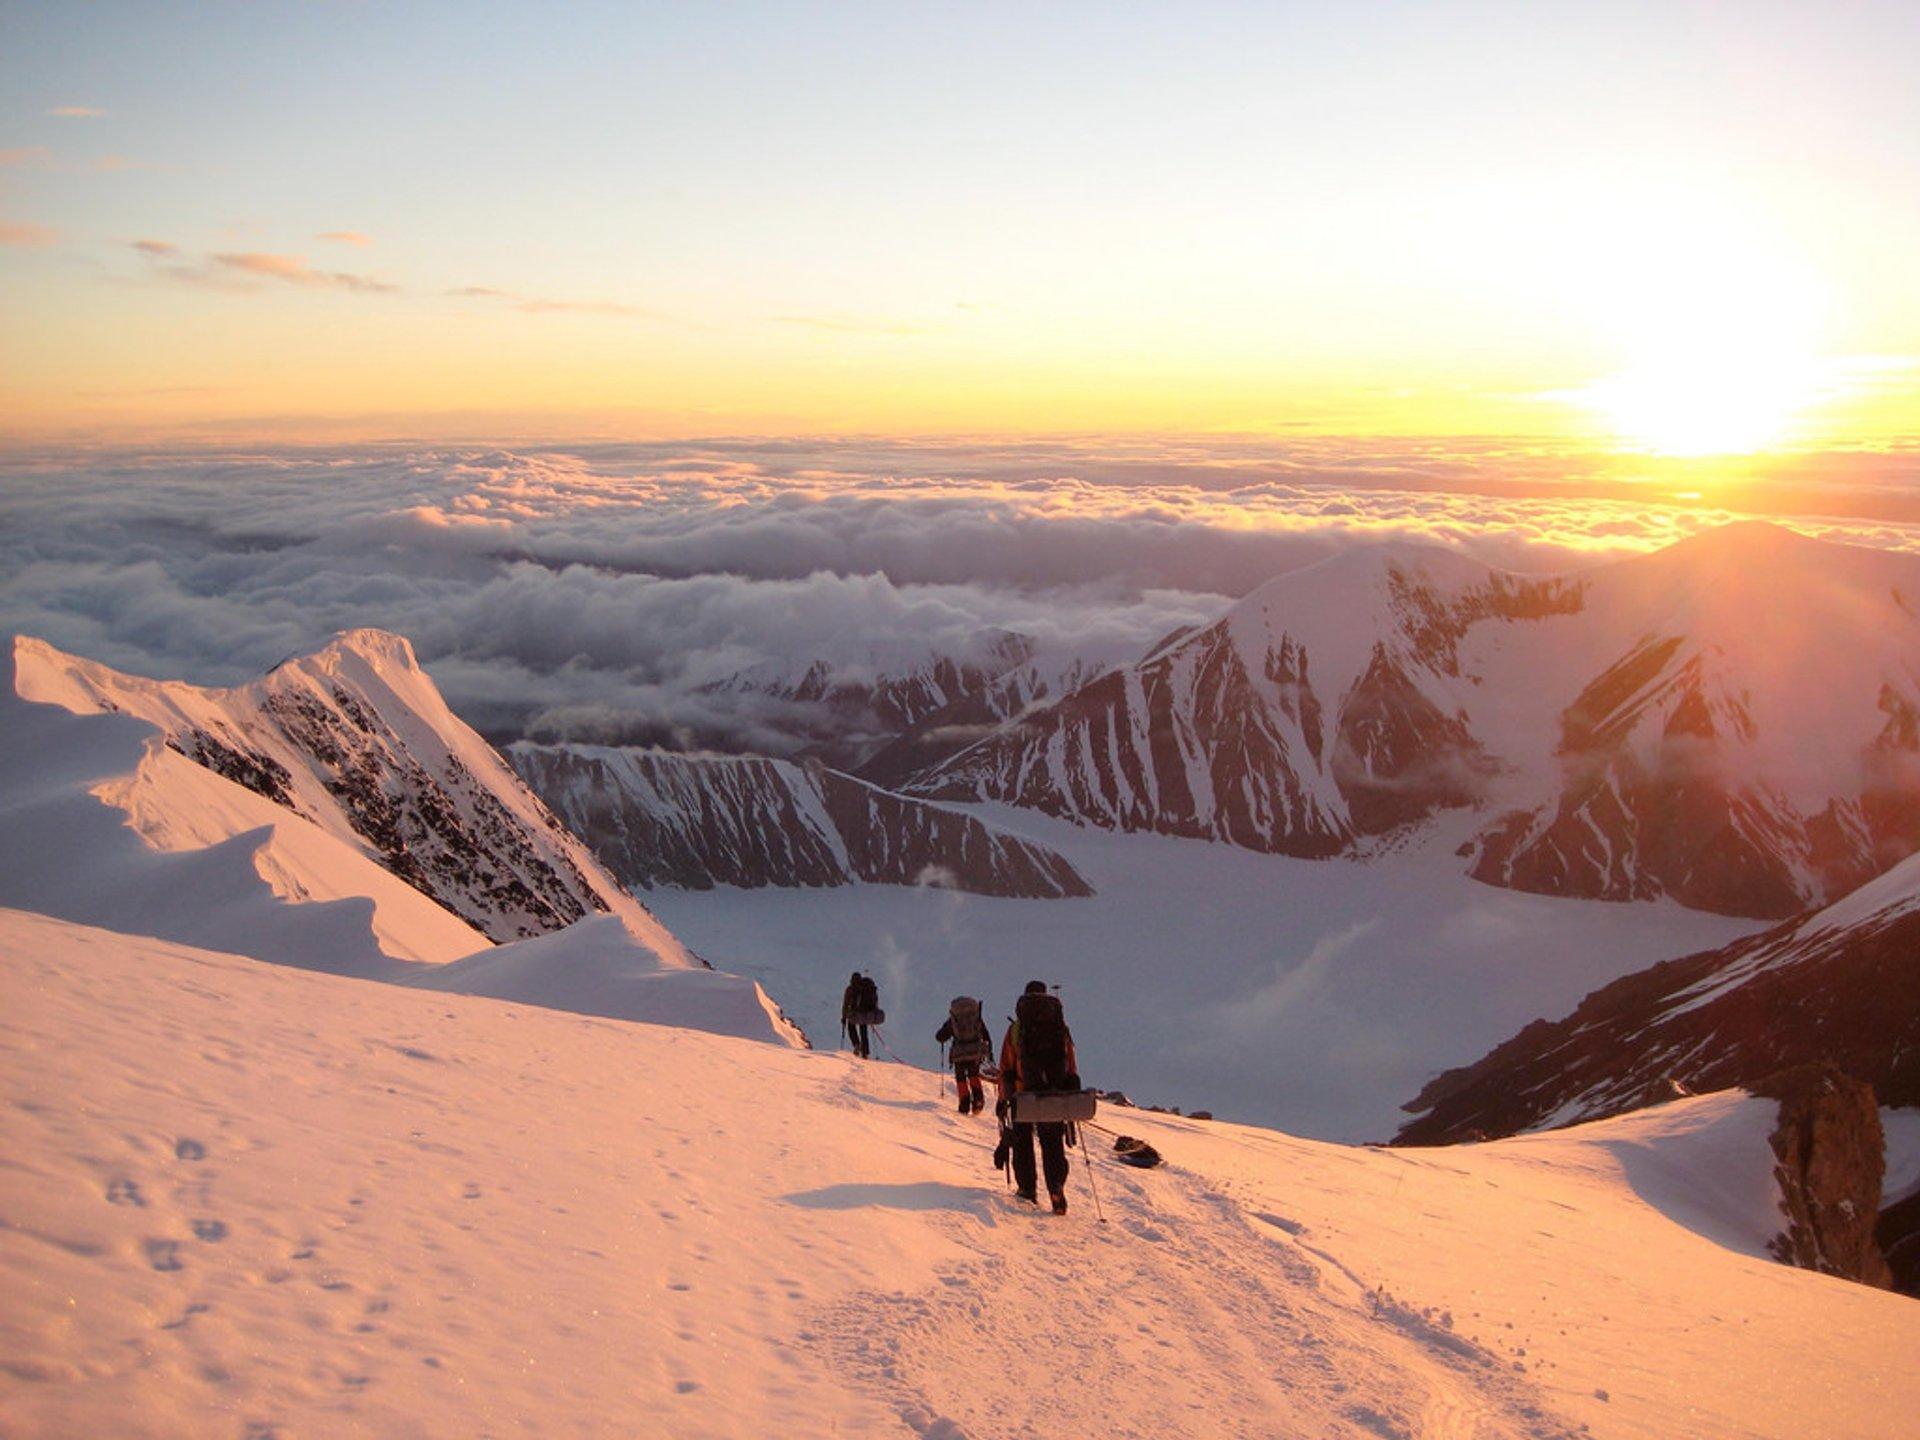 Descending Mt. McKinley in Midnight Sun 2020